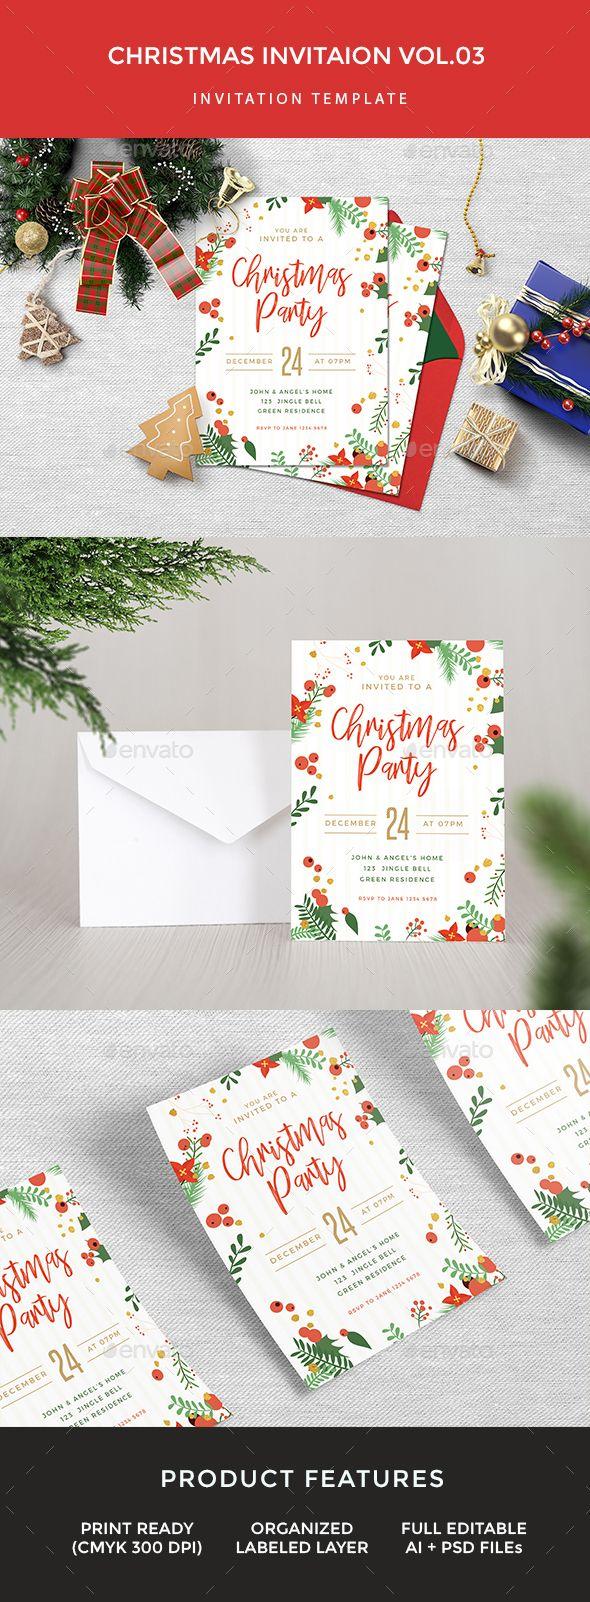 company christmas party invitation templates%0A Christmas Invitation  Invitation Card